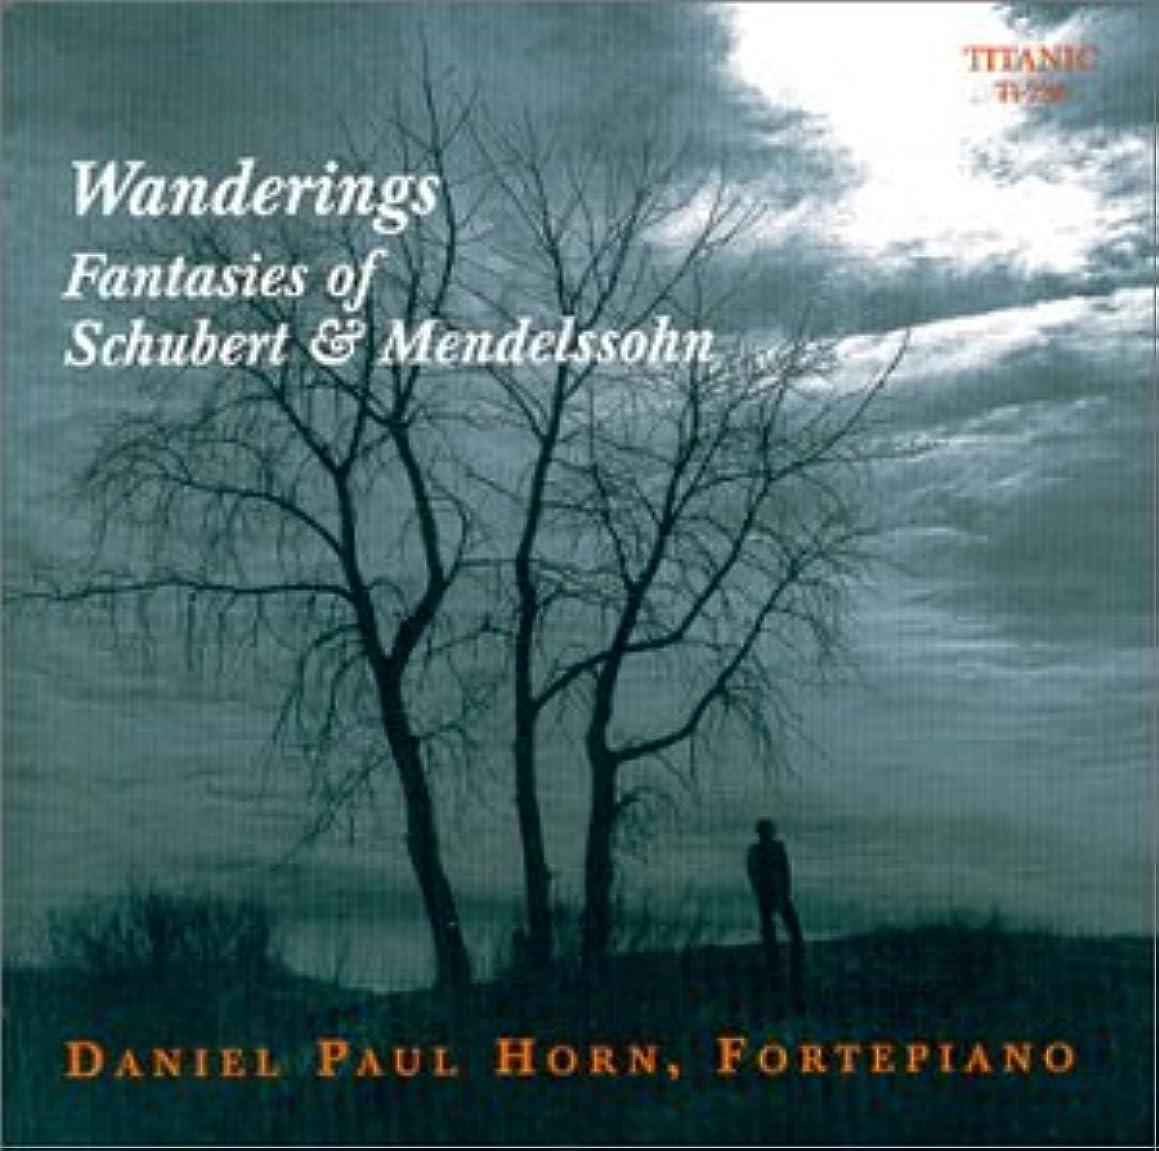 Wanderings: Fantasies of Schubert & Mendelssohn